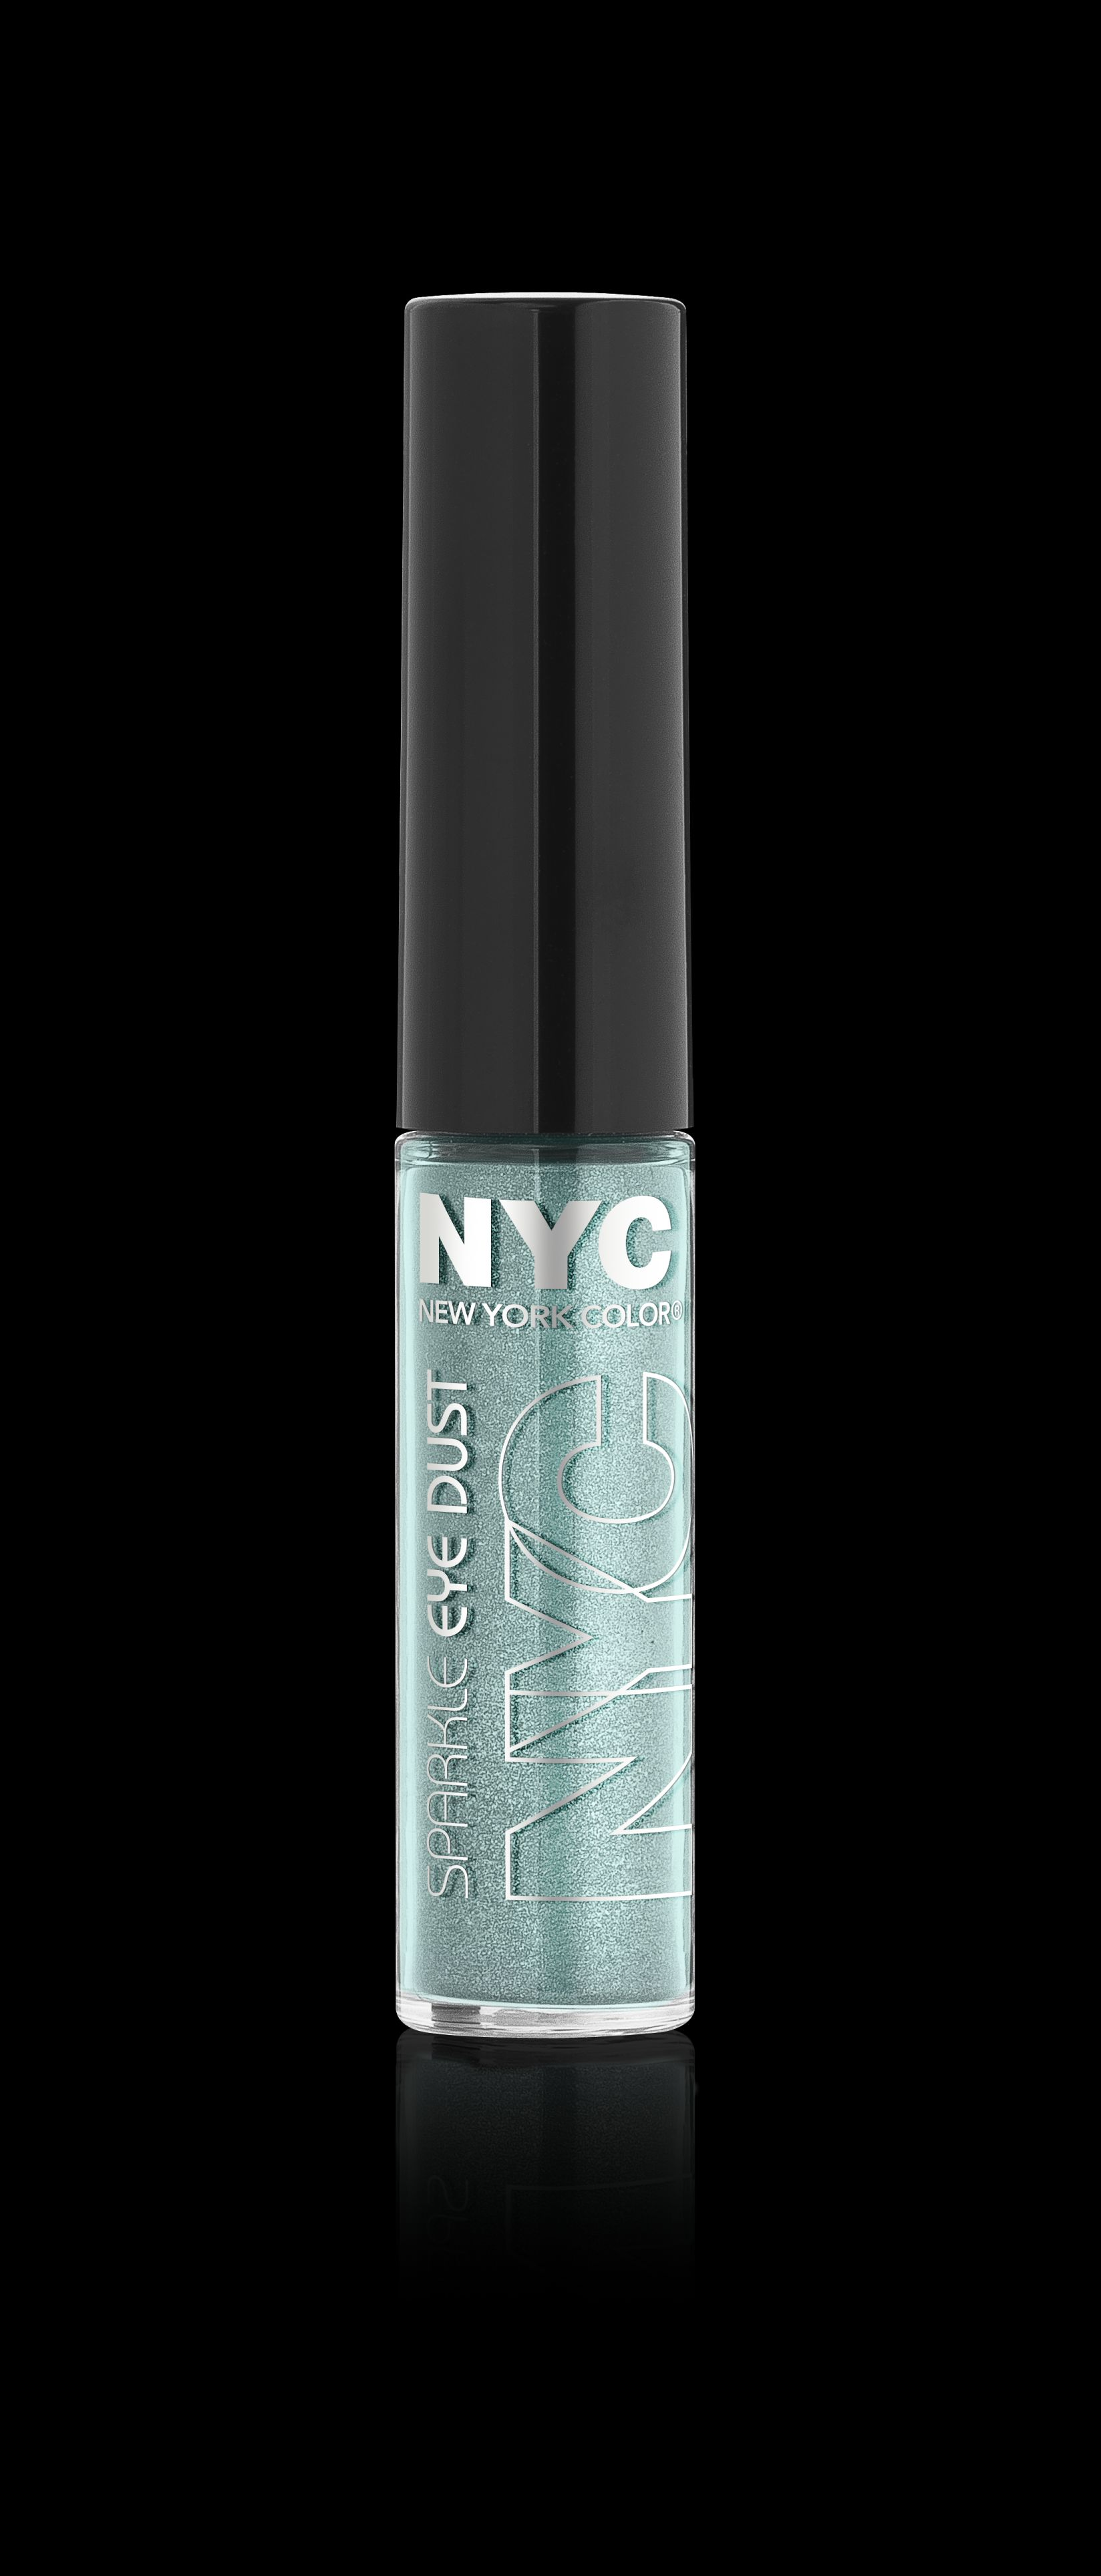 NYC_Sparkle_Eye_Dust_aqua.jpg